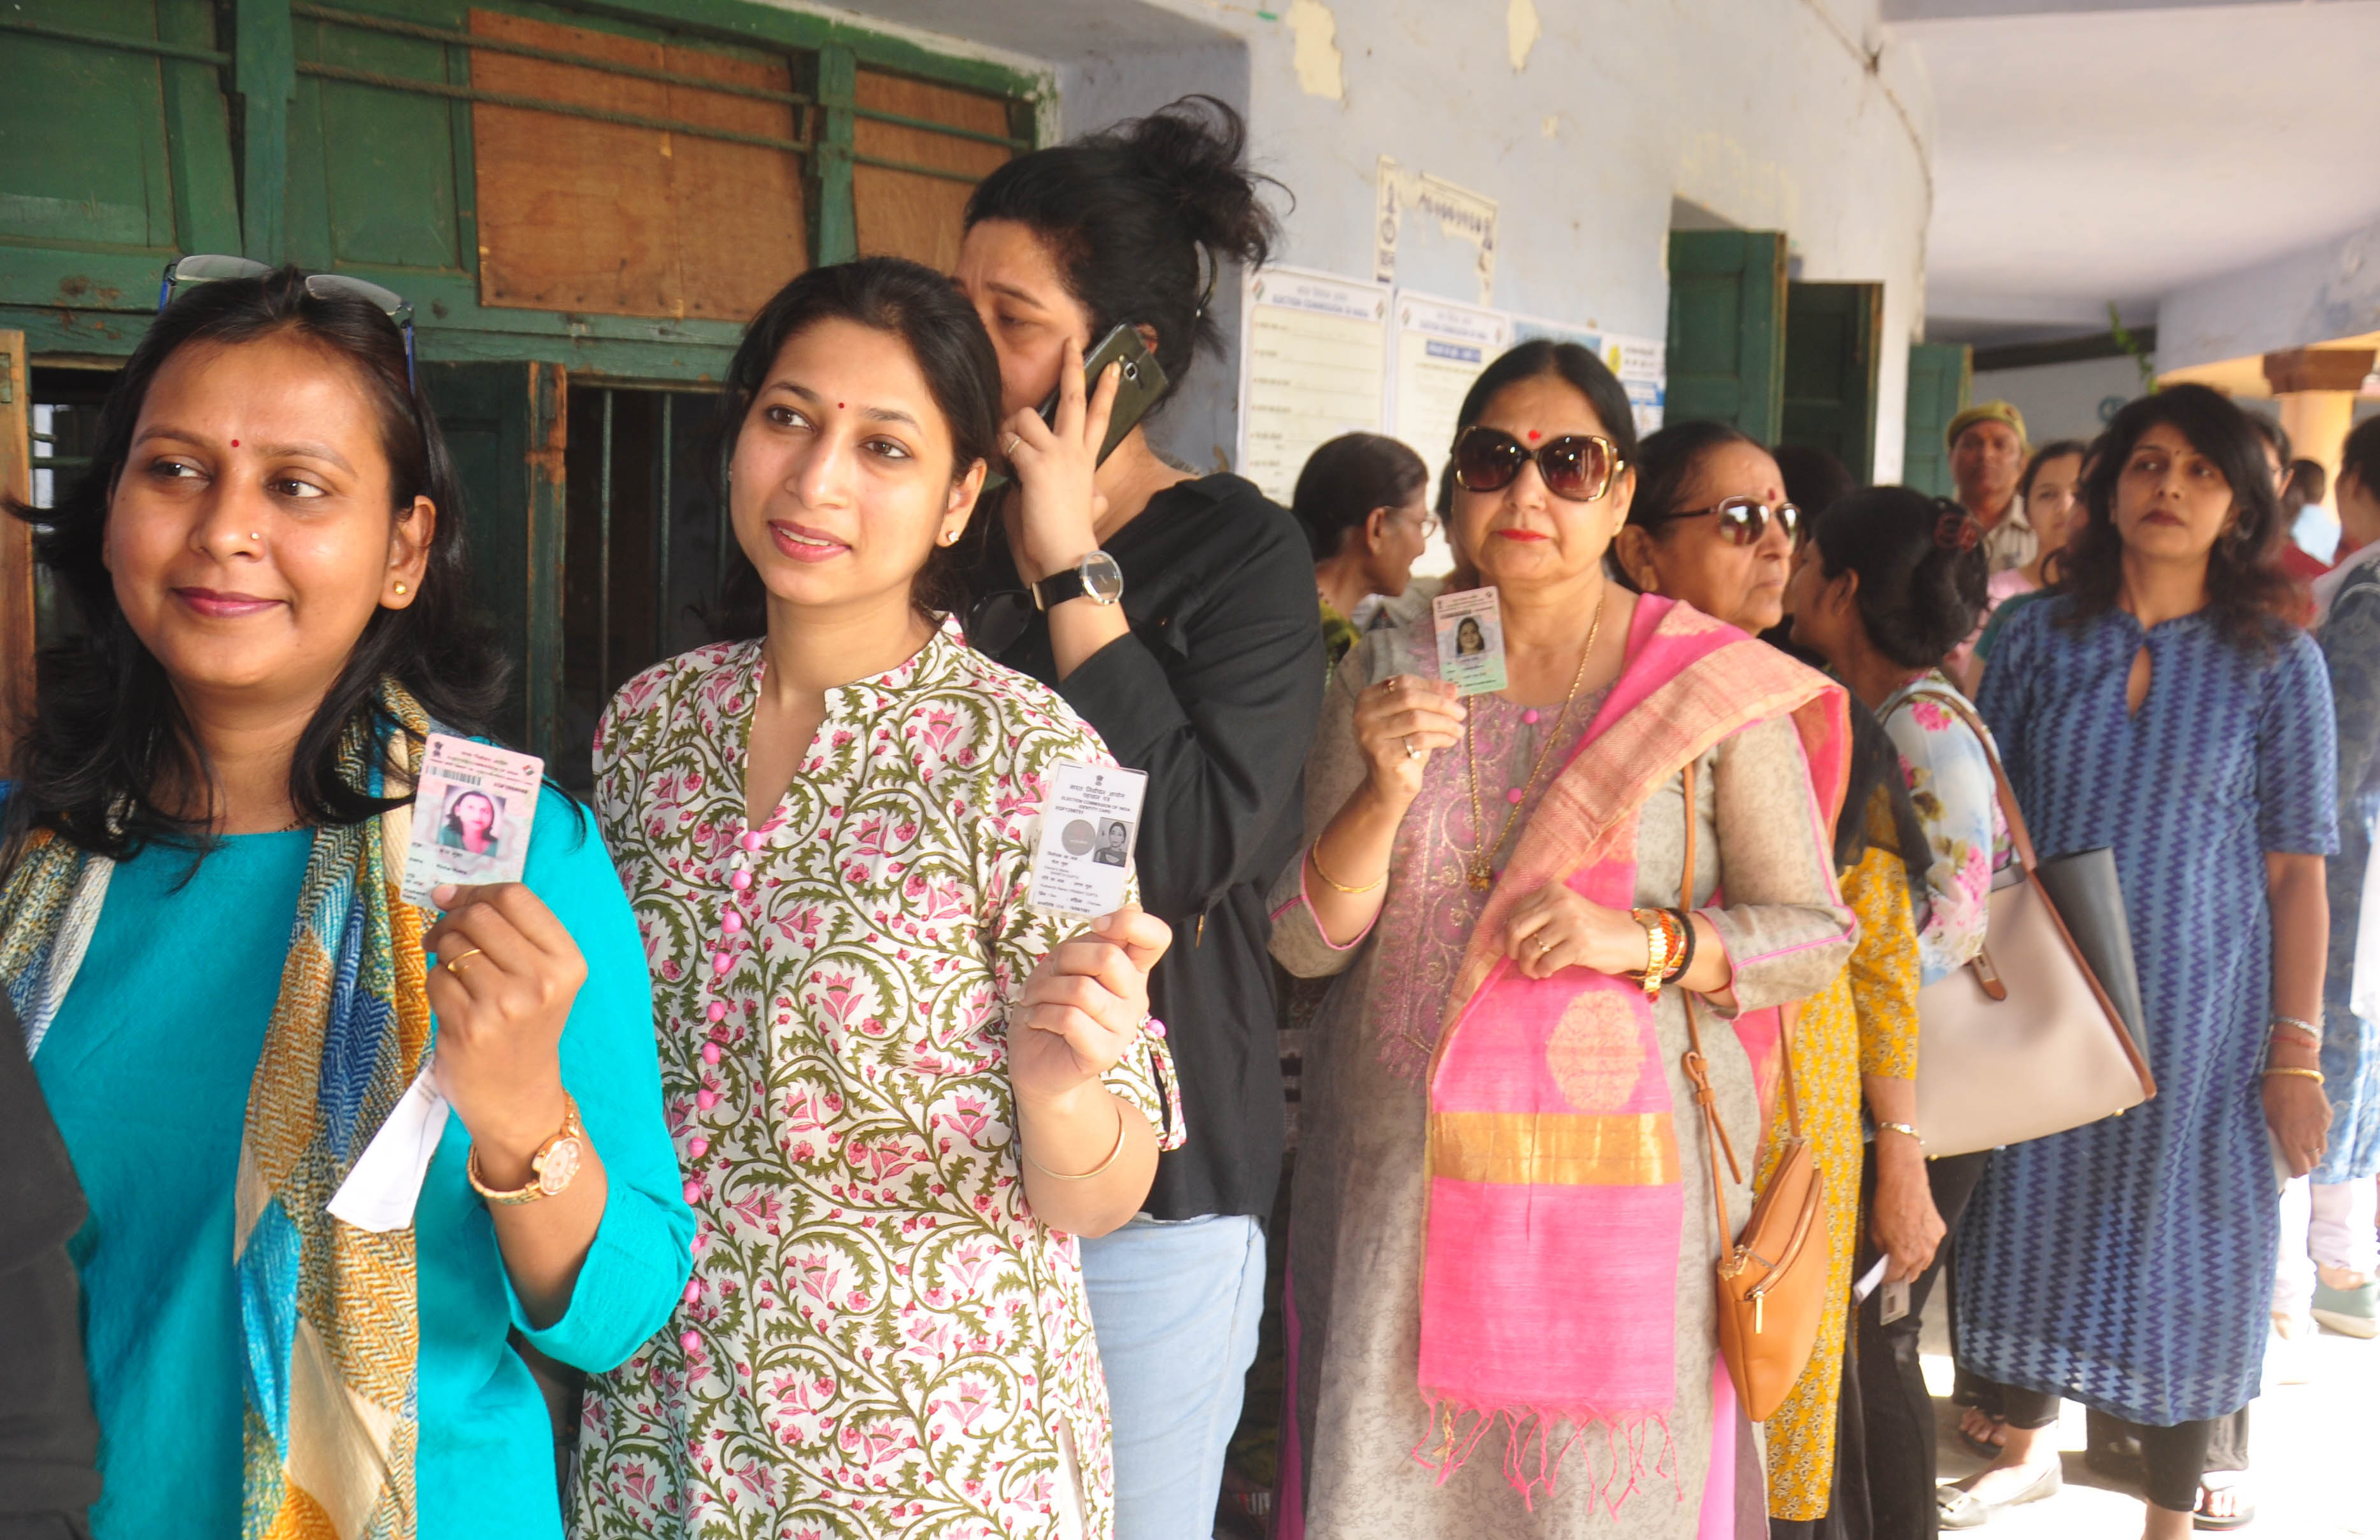 Telangana voters in queue to choose representatives in local polls